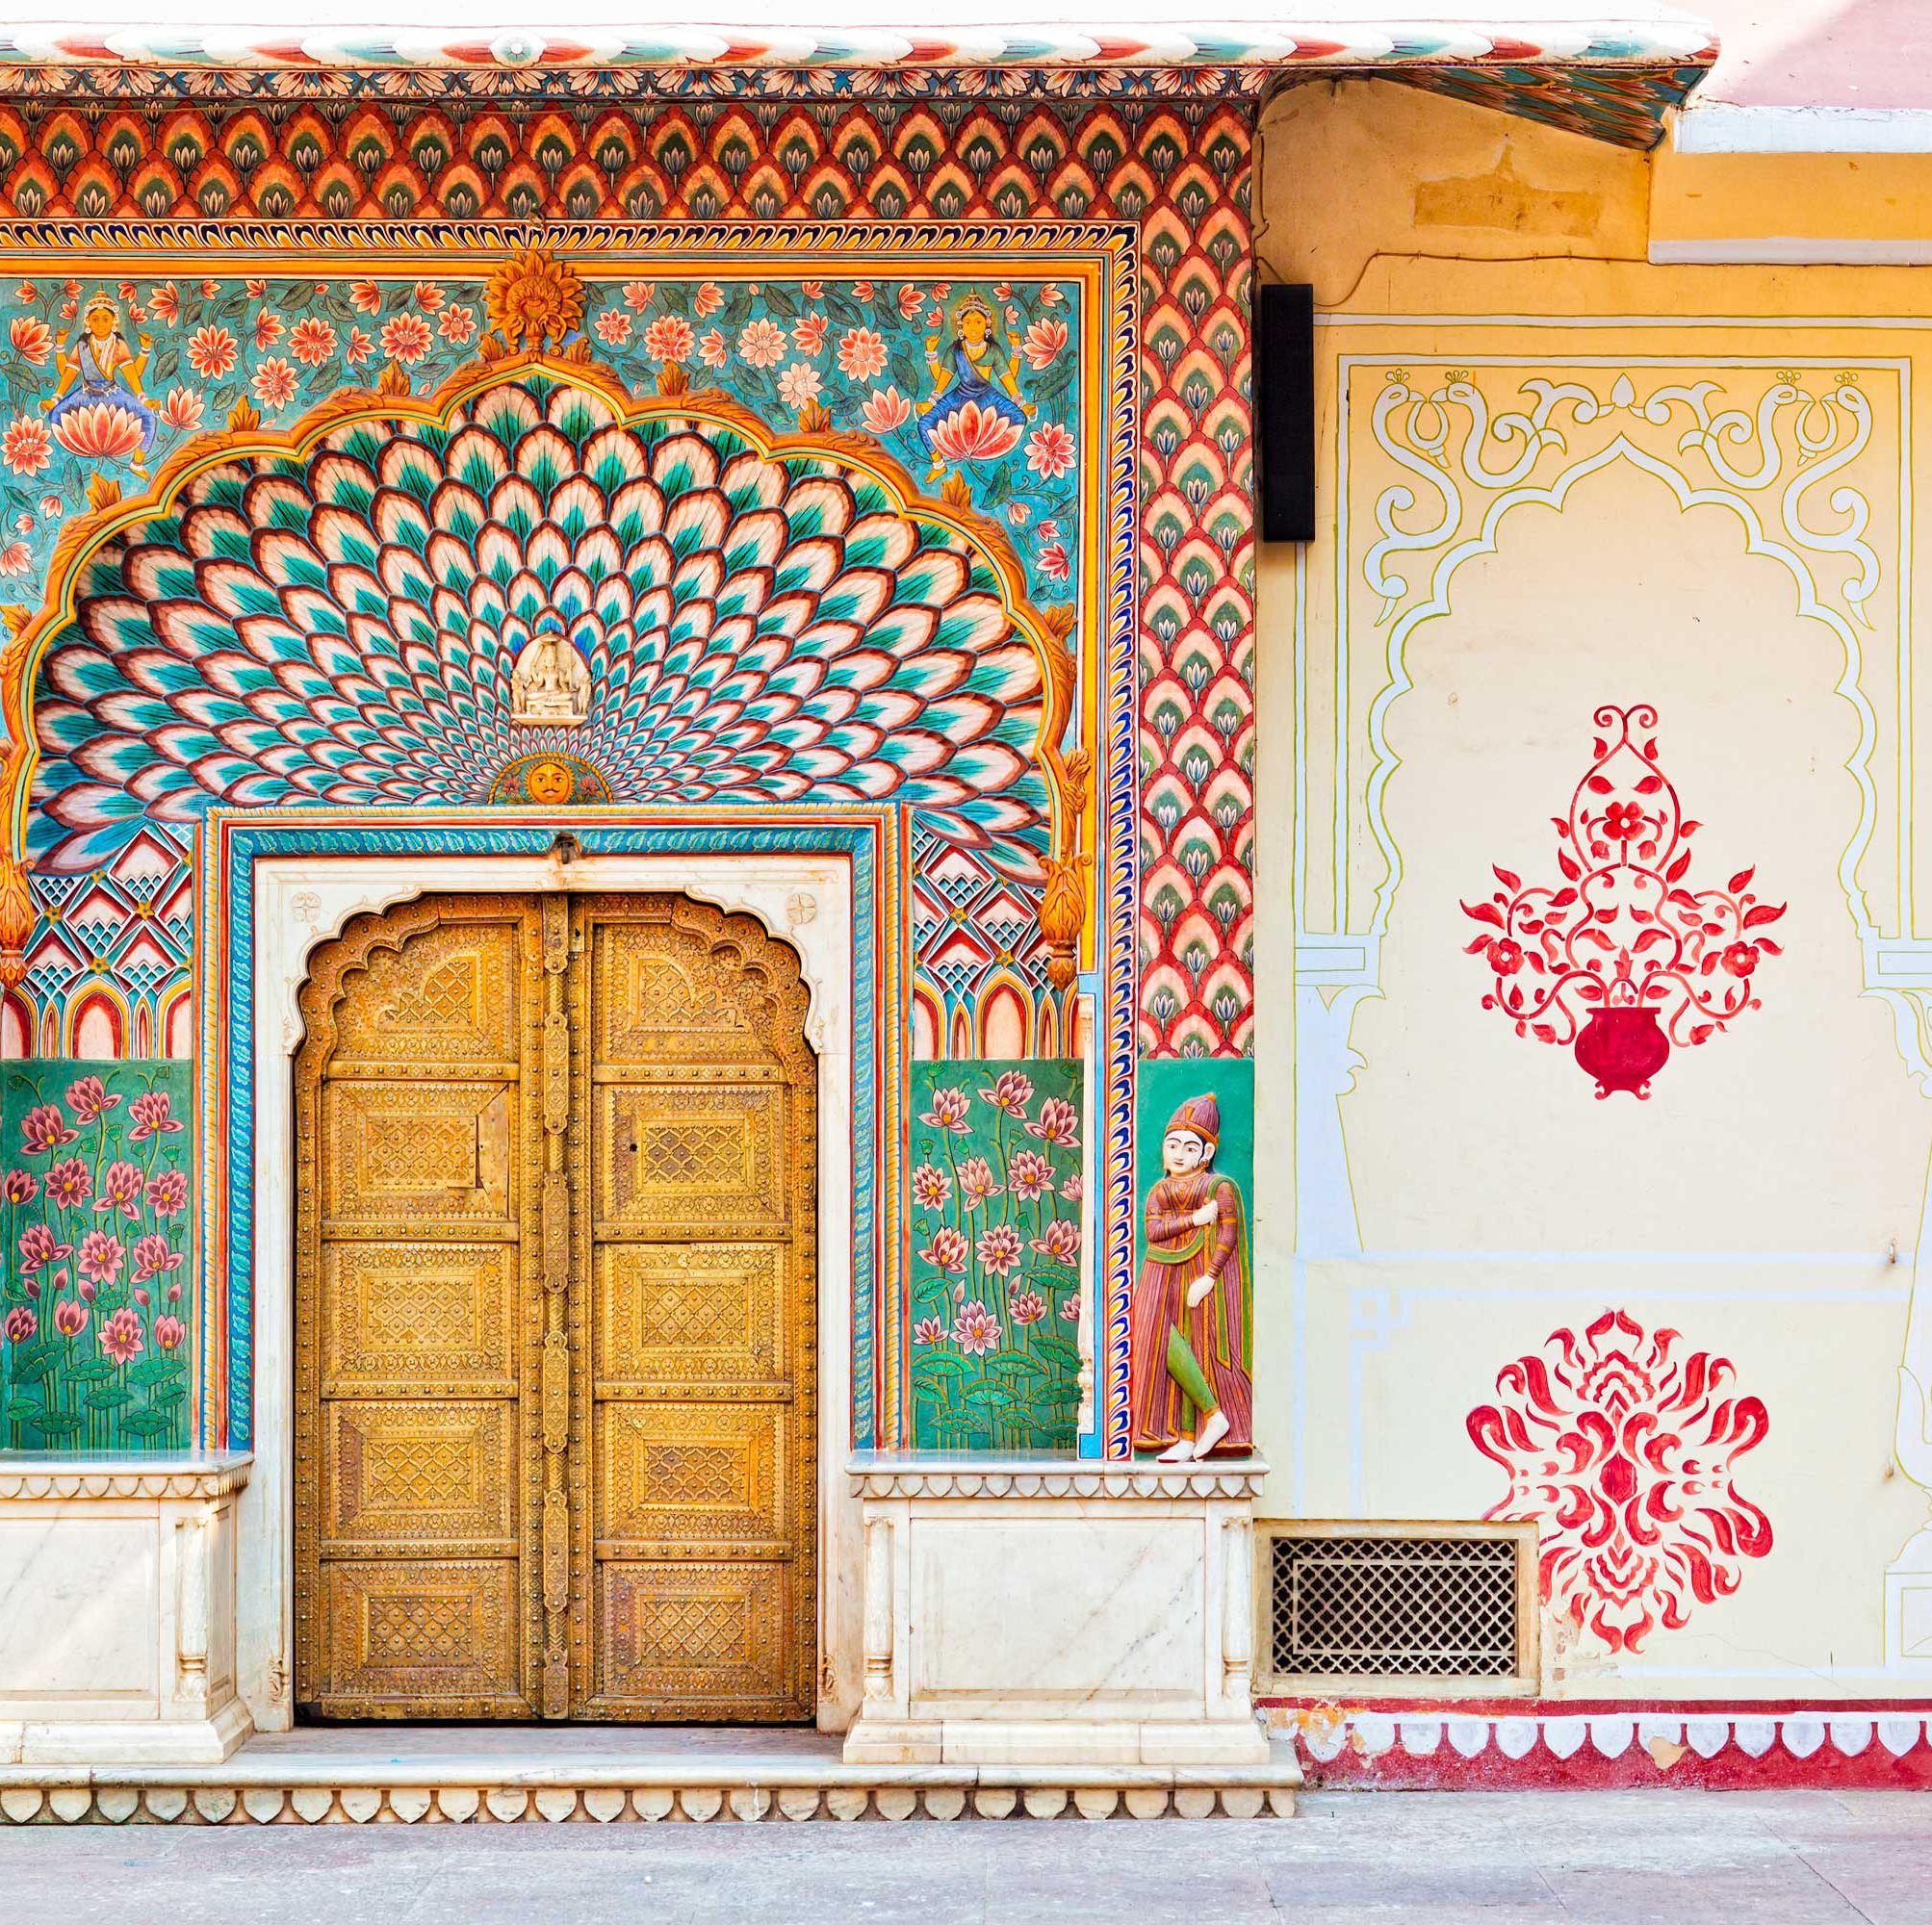 jaipur-doorway-elaborate-detail-colour-india-design.jpg